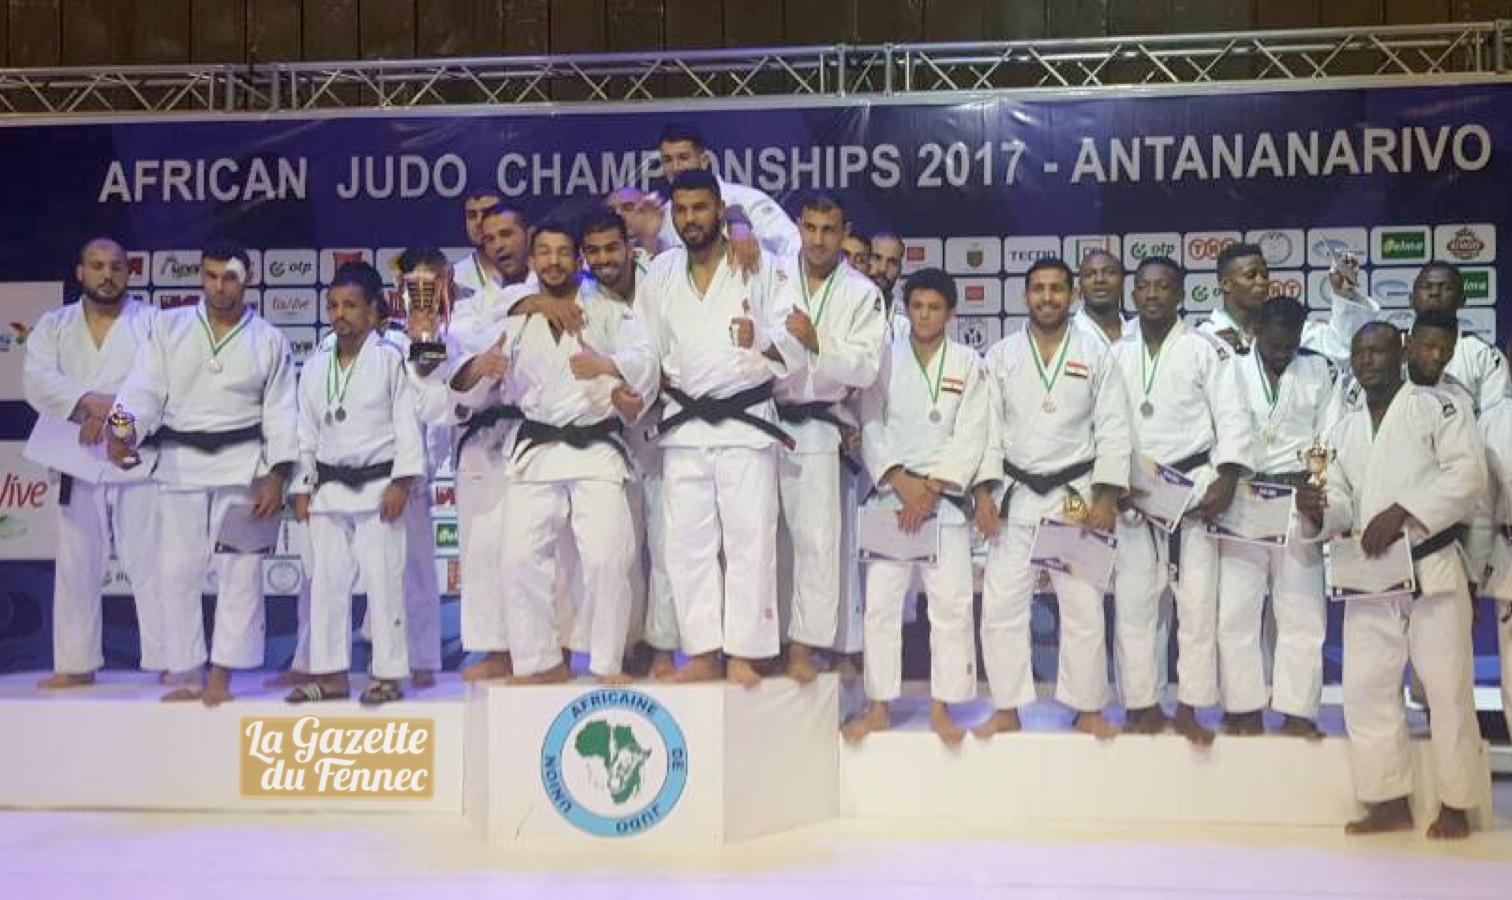 judo maculin podium champion afrique 2017 antanarrivo